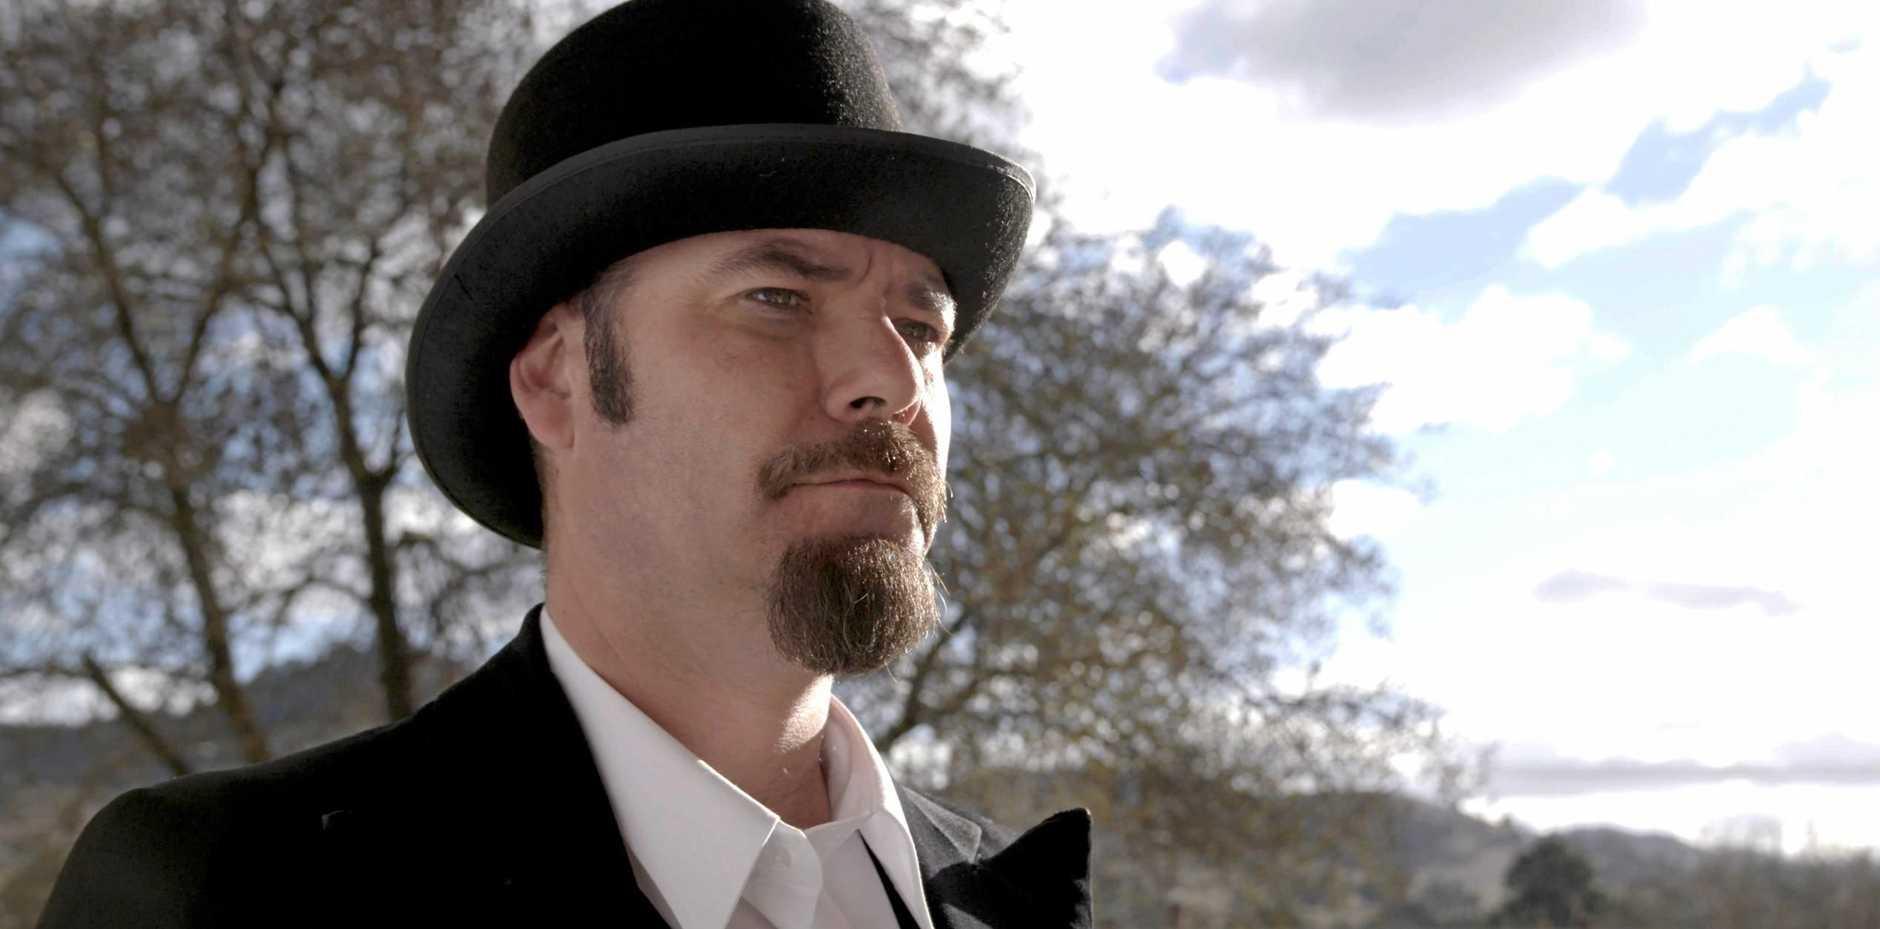 ASHTON FILM: Tamworth local Ben Fletcher in the role of James Ashton